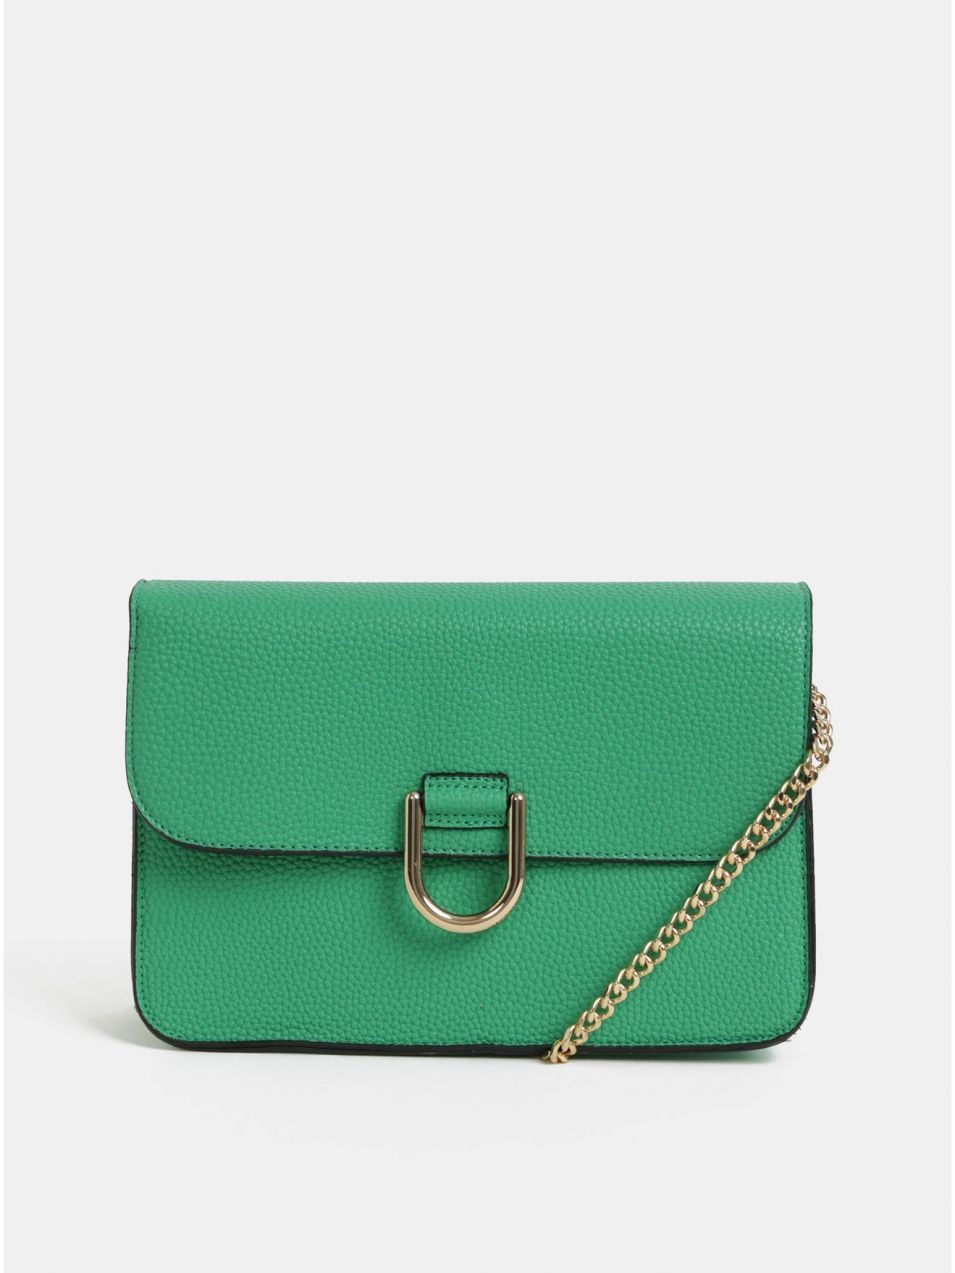 Zelená crossbody kabelka Dorothy Perkins značky Dorothy Perkins ... 1943dc76caa